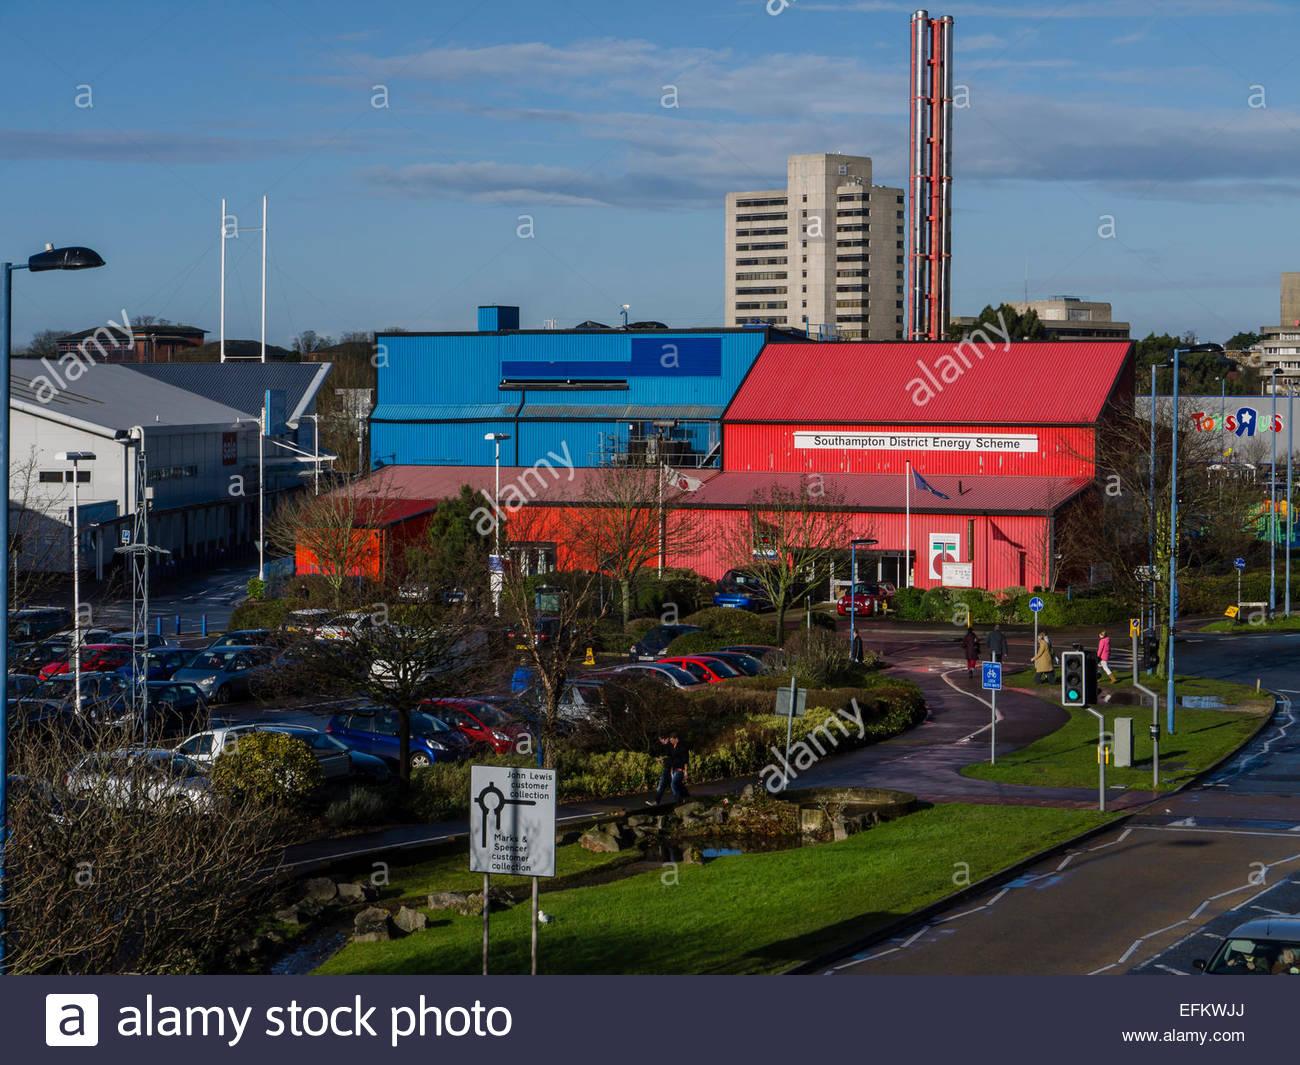 Southampton Hampshire England UK District Energy Scheme Geothermal energy heat resource - Stock Image